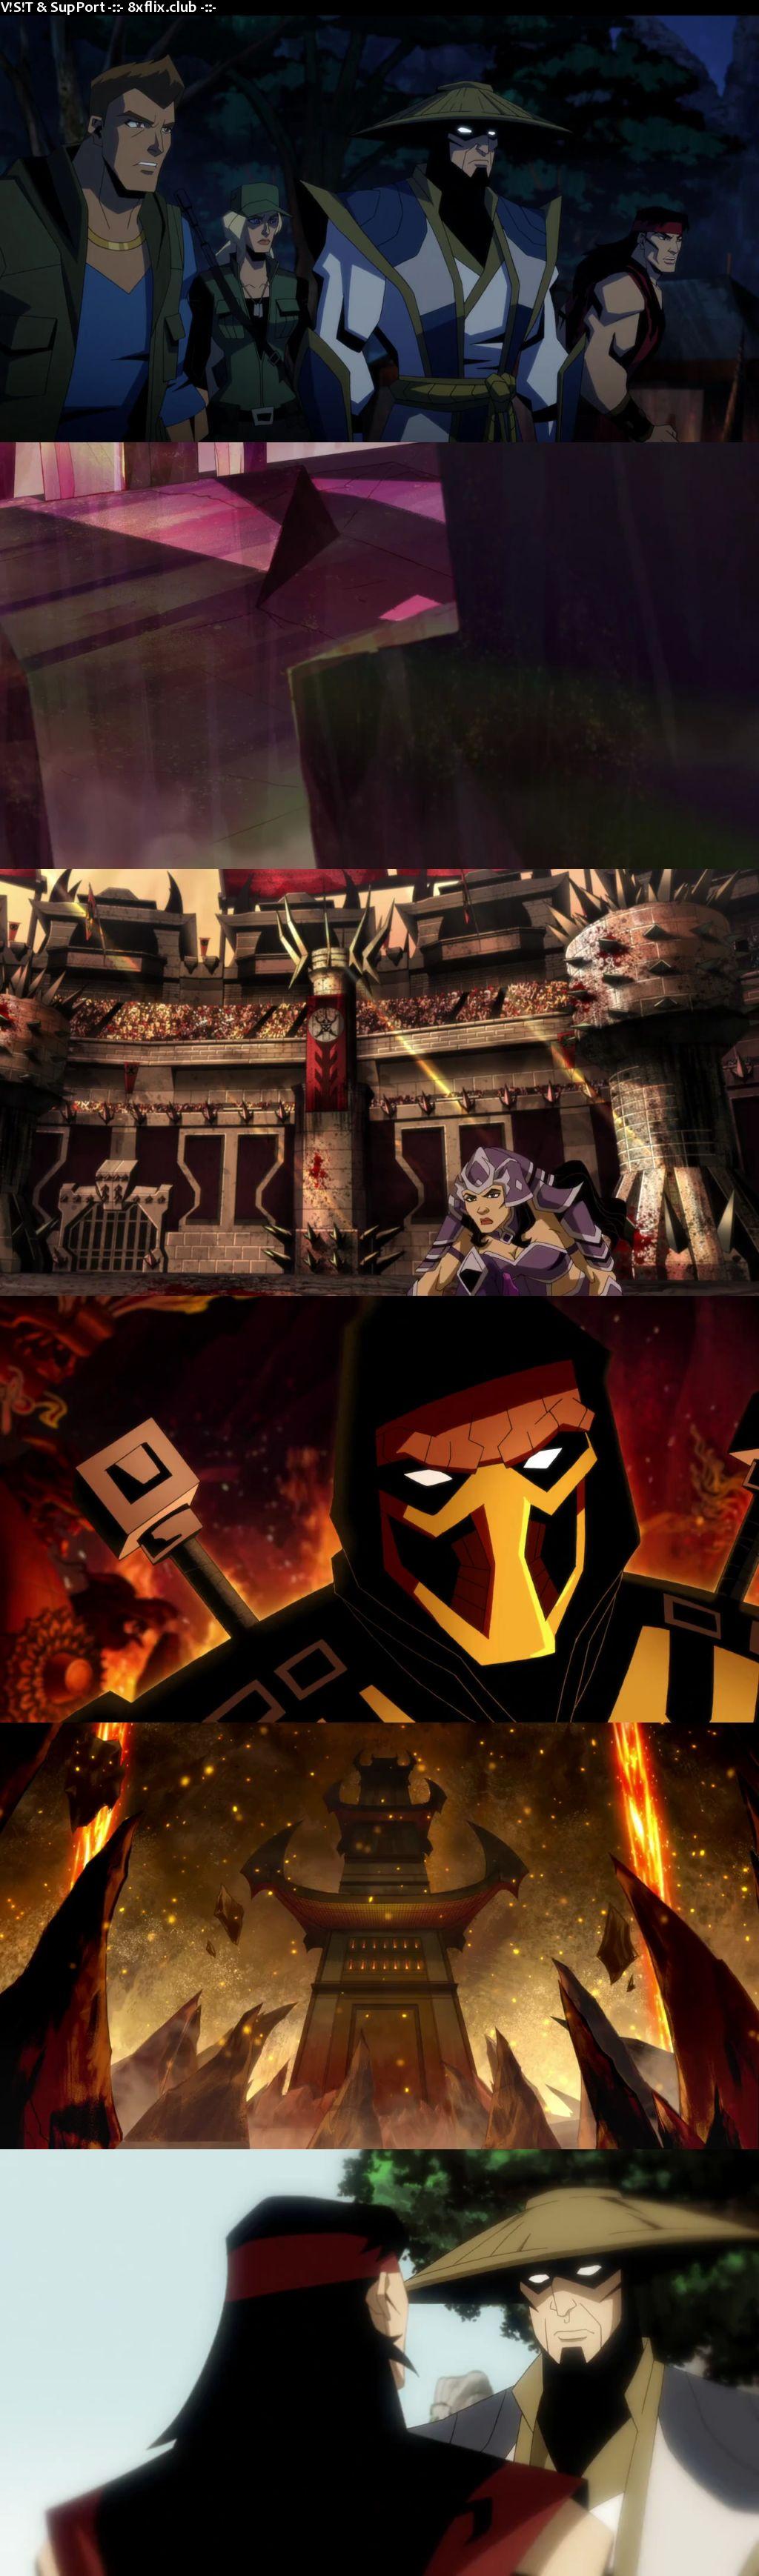 Mortal Kombat Legends Battle Of The Realms 2021 English 720p 480p Web-DL HD